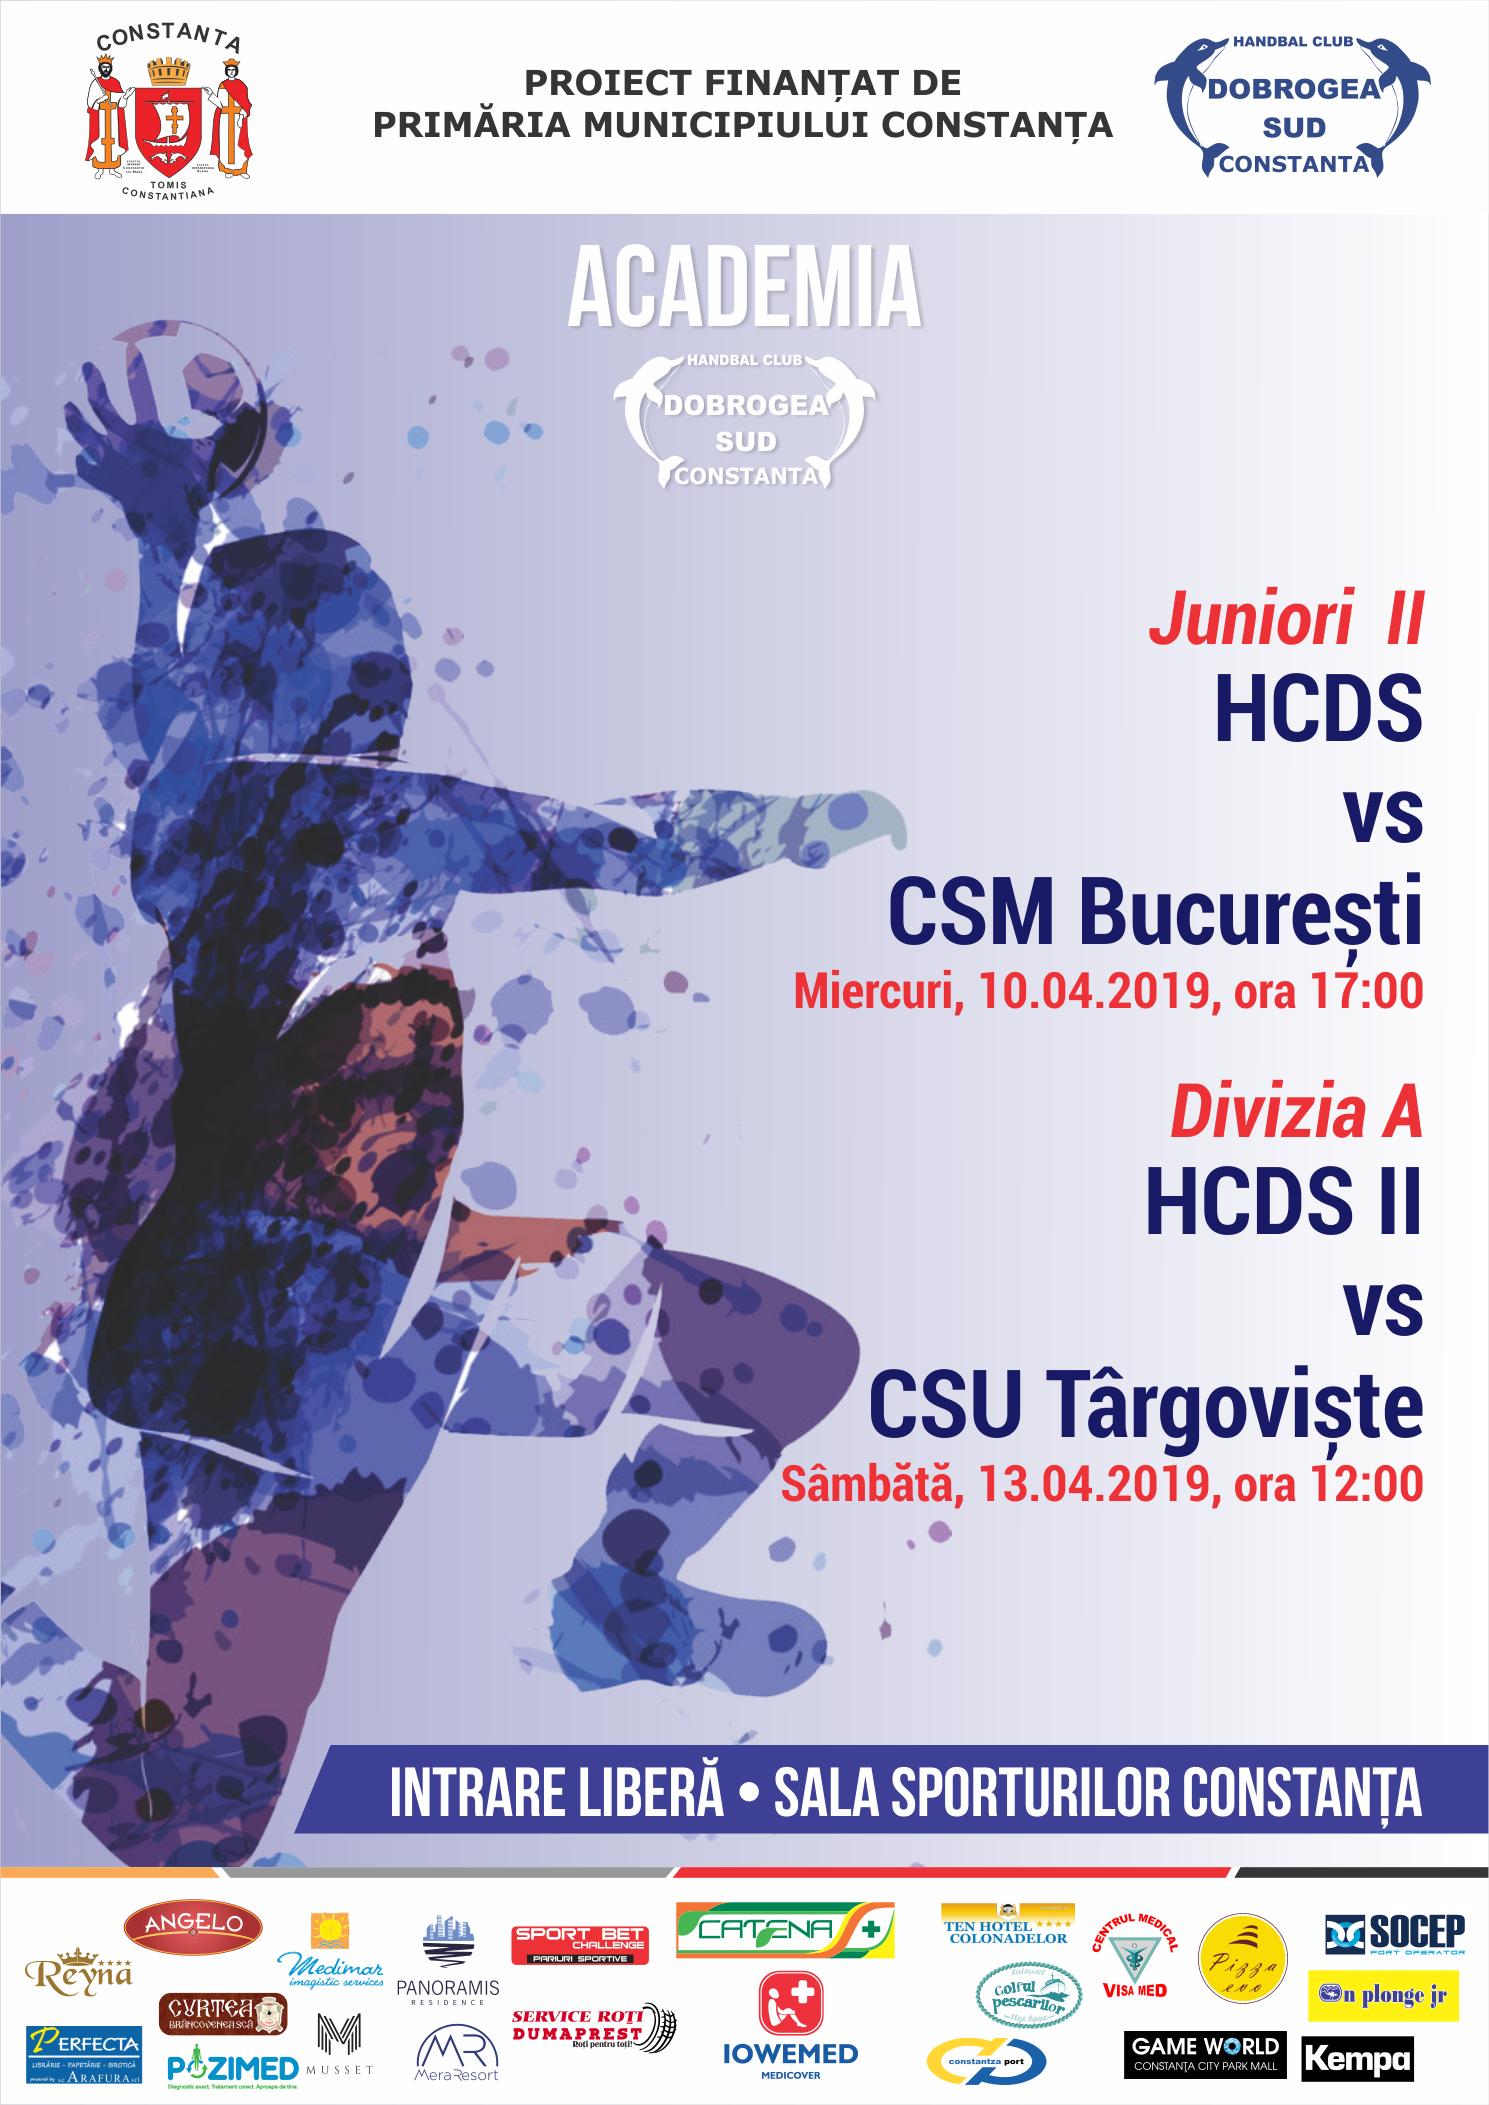 afis Academia Dobrogea Sud Constanta HCDS vs. CSU Targoviste 13.04.2019